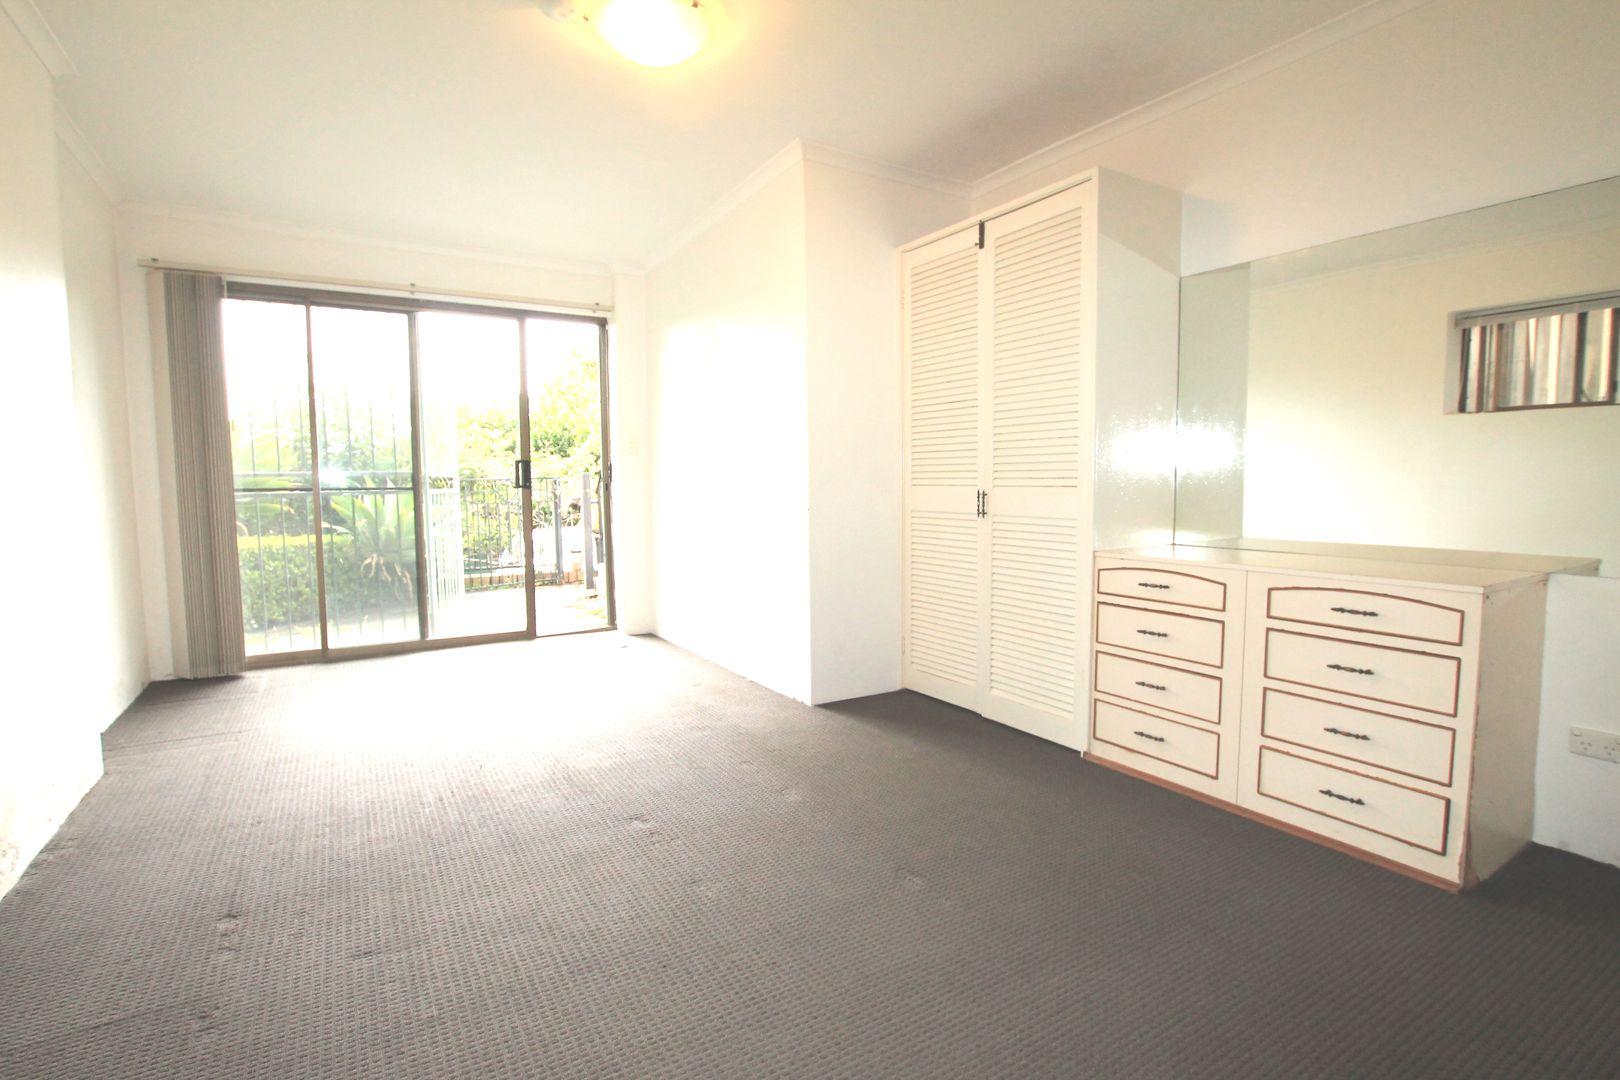 6/211 Edgecliff Road, Woollahra NSW 2025, Image 0